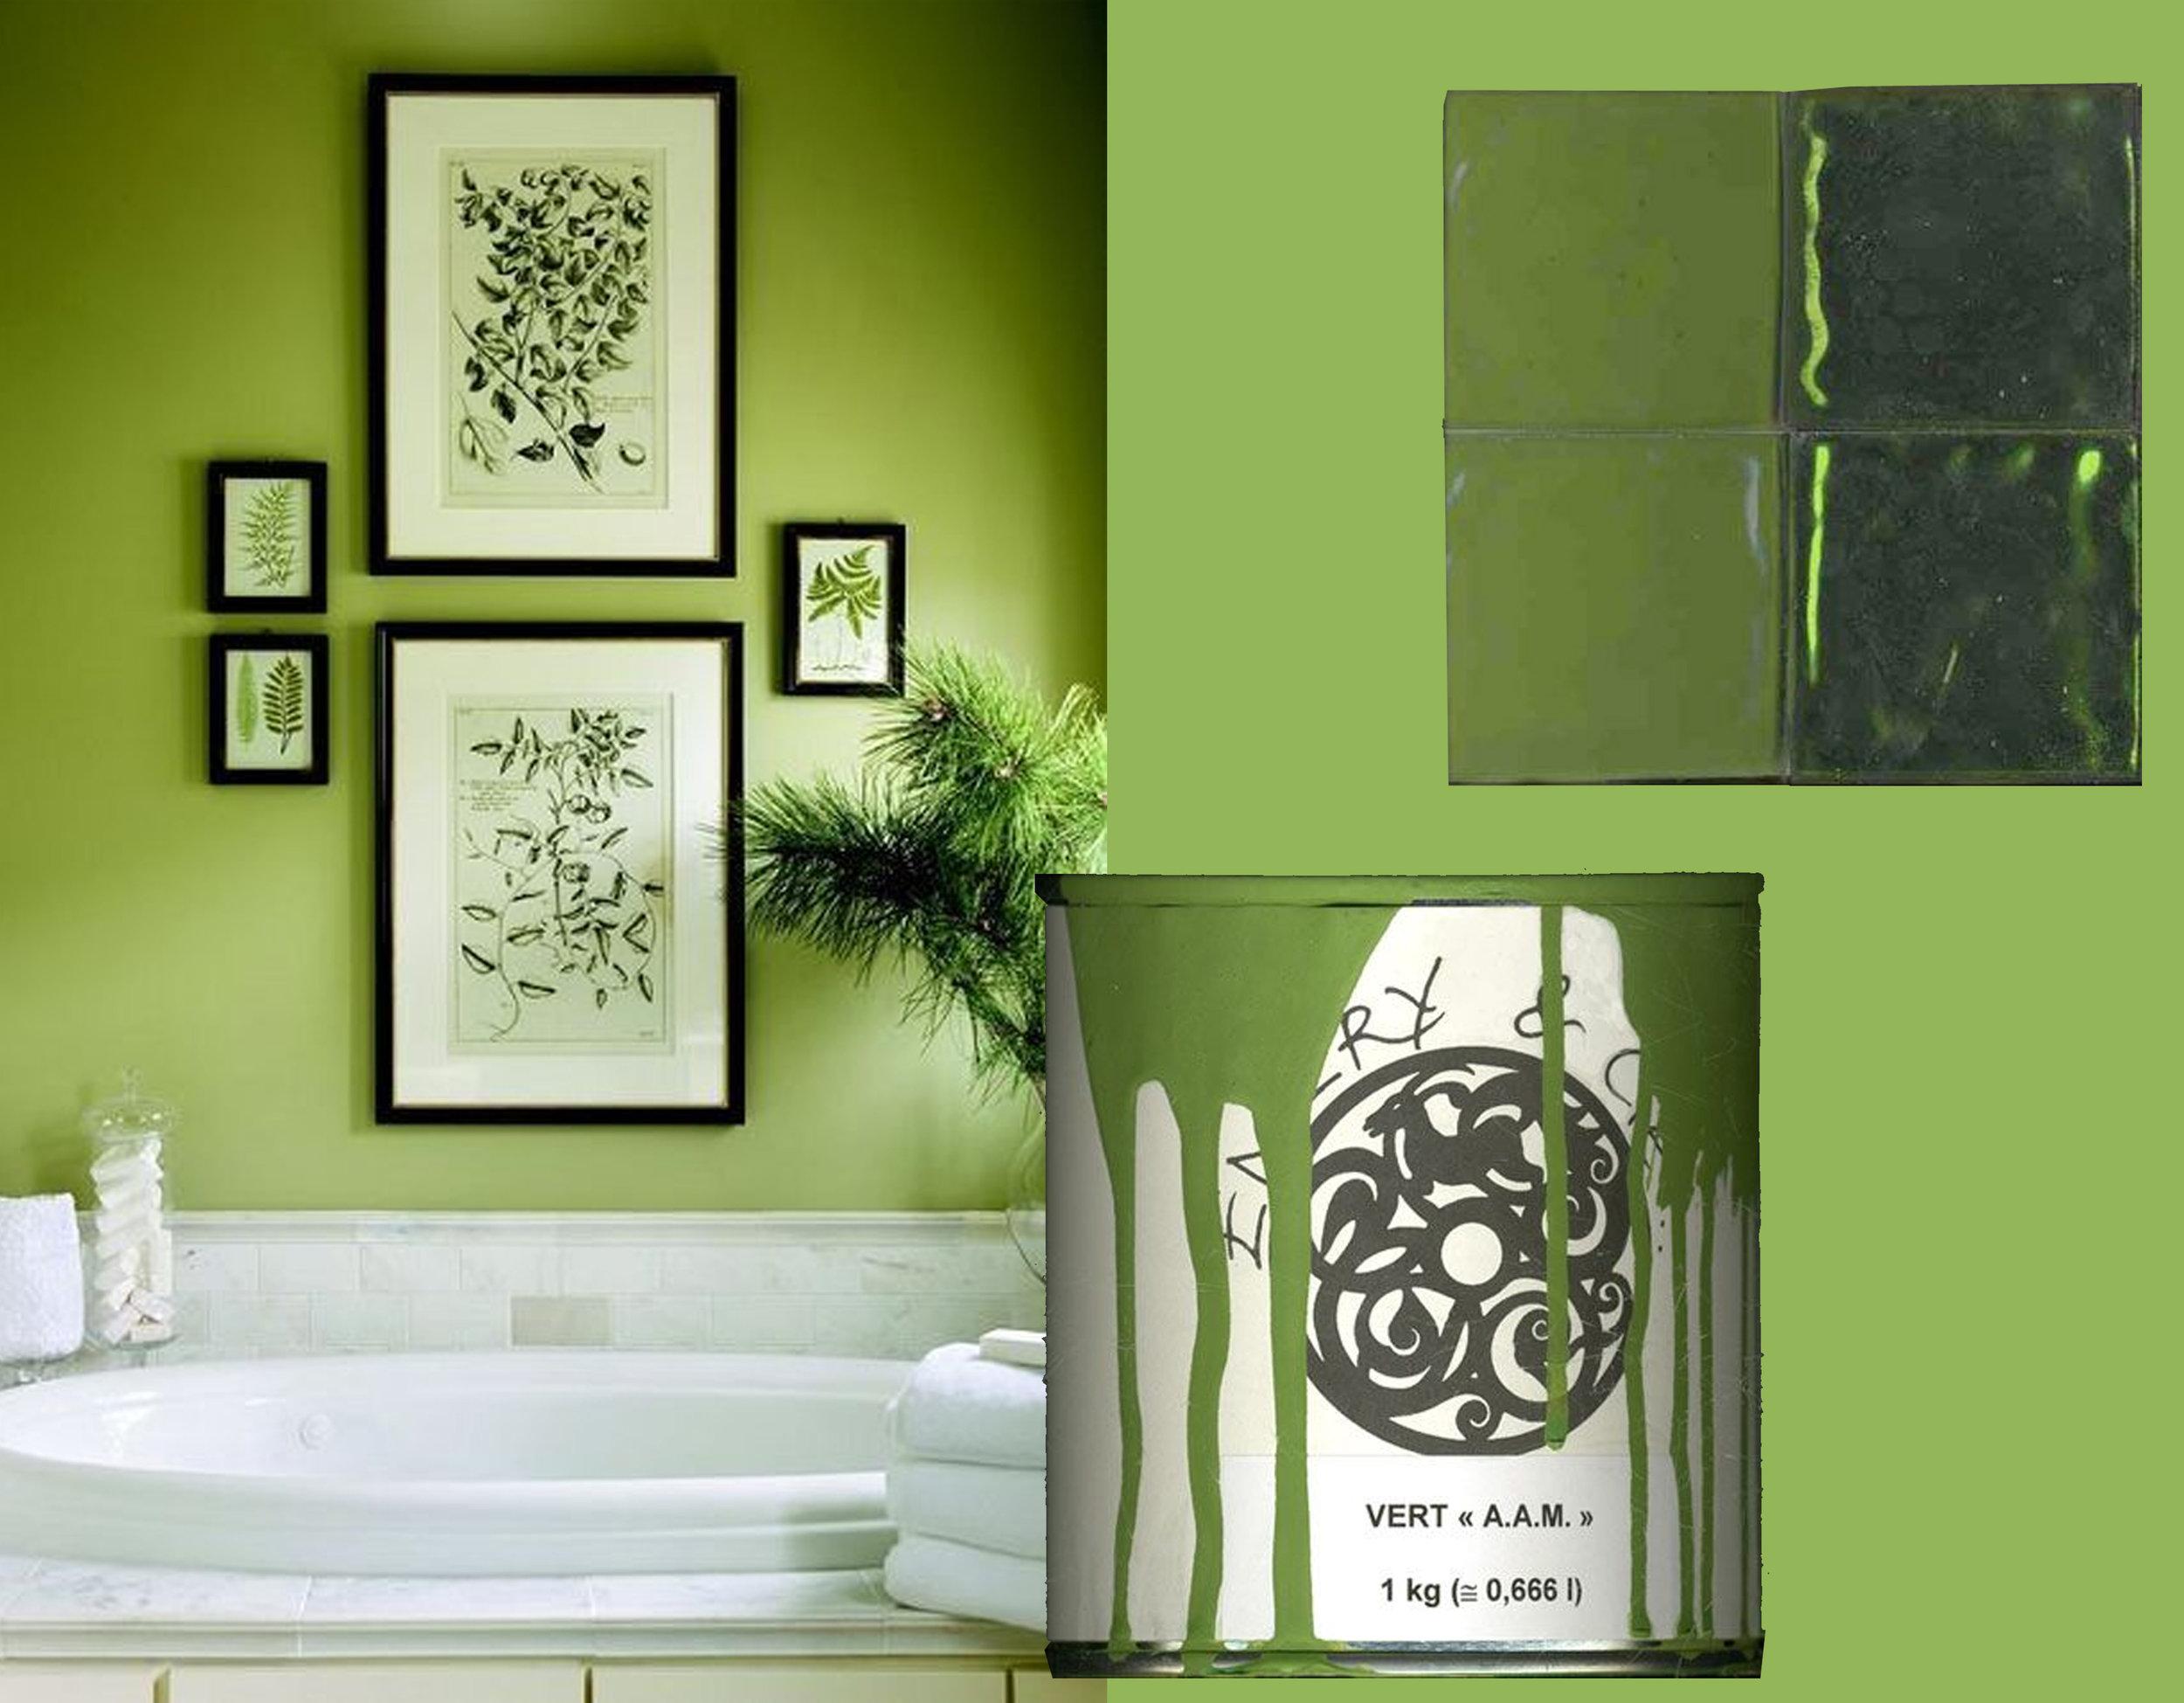 image bathroom via  The English Room  - paint  Emery  - glass tiles  Emery